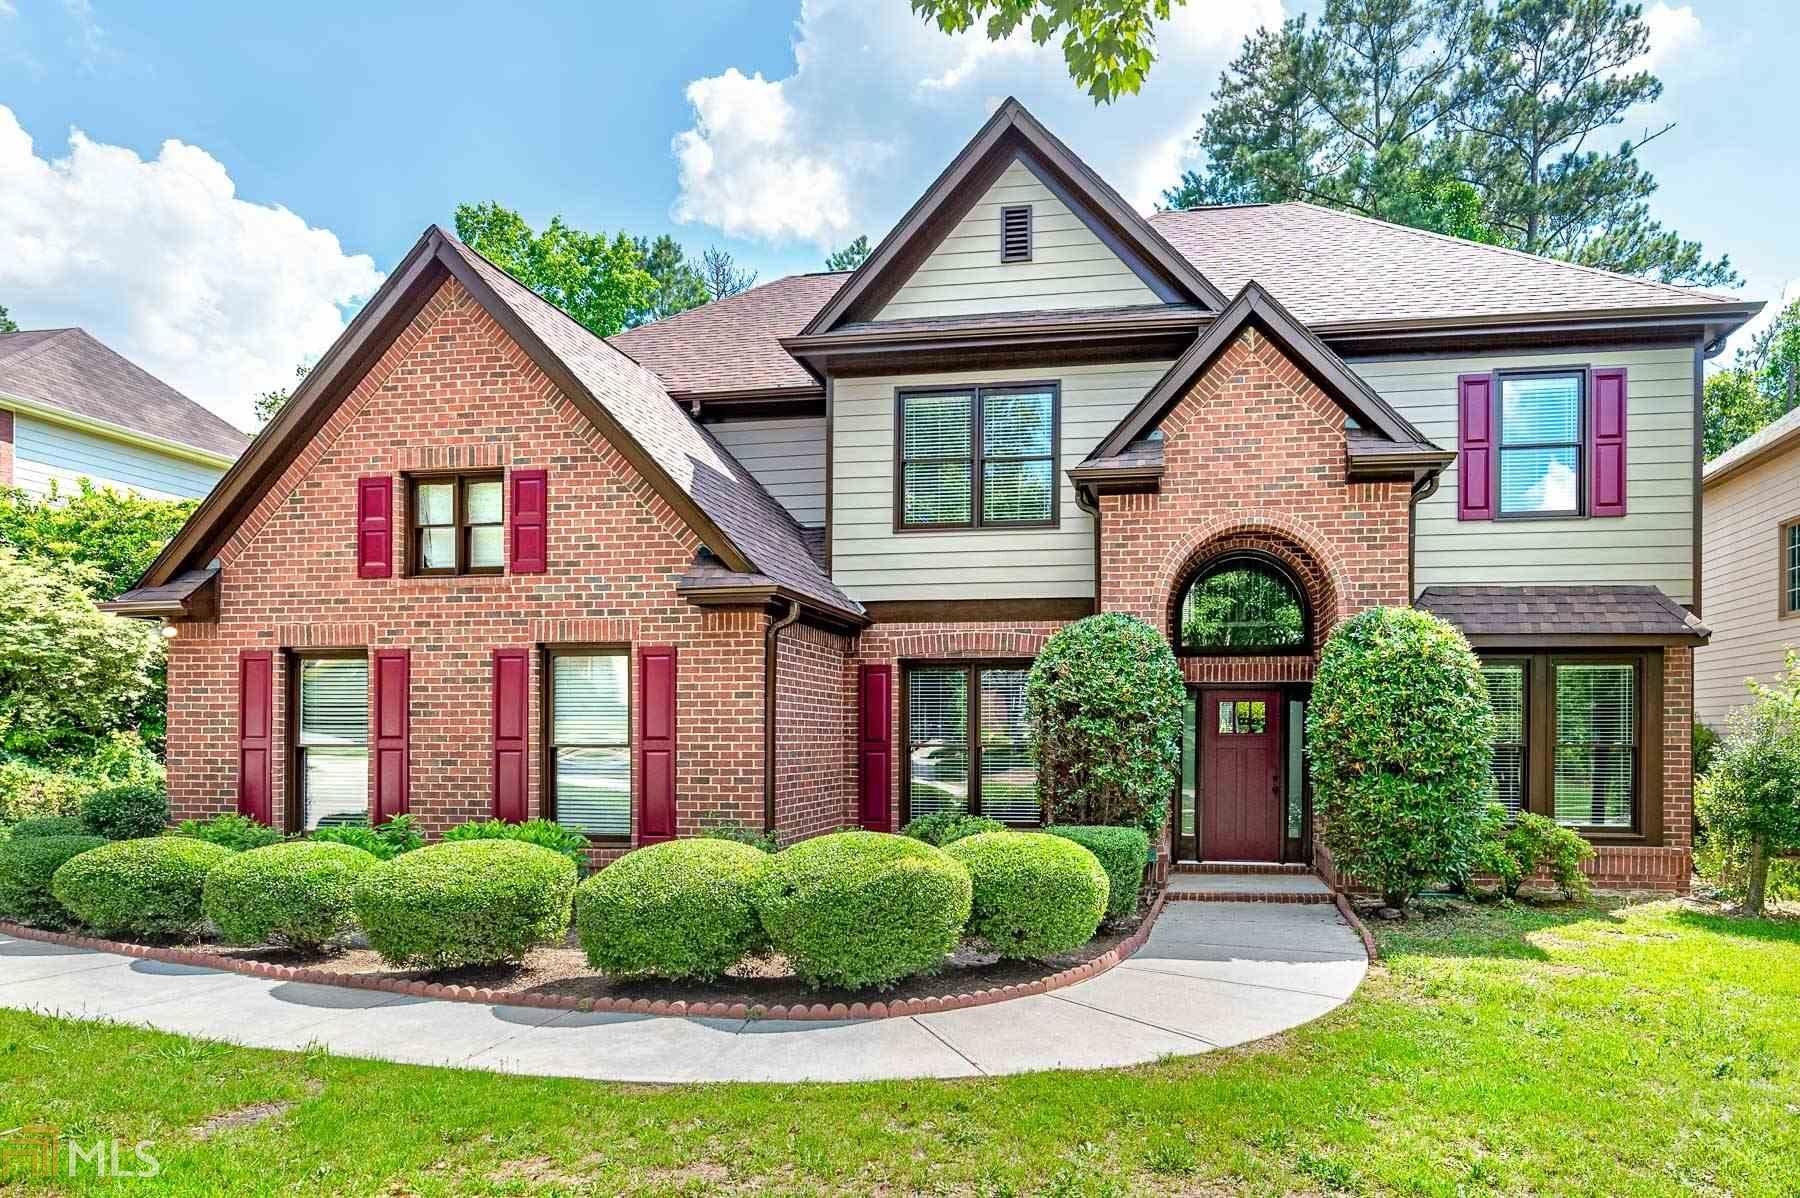 3745 Renaissance Cir, Atlanta, GA 30349 - MLS#: 8808181